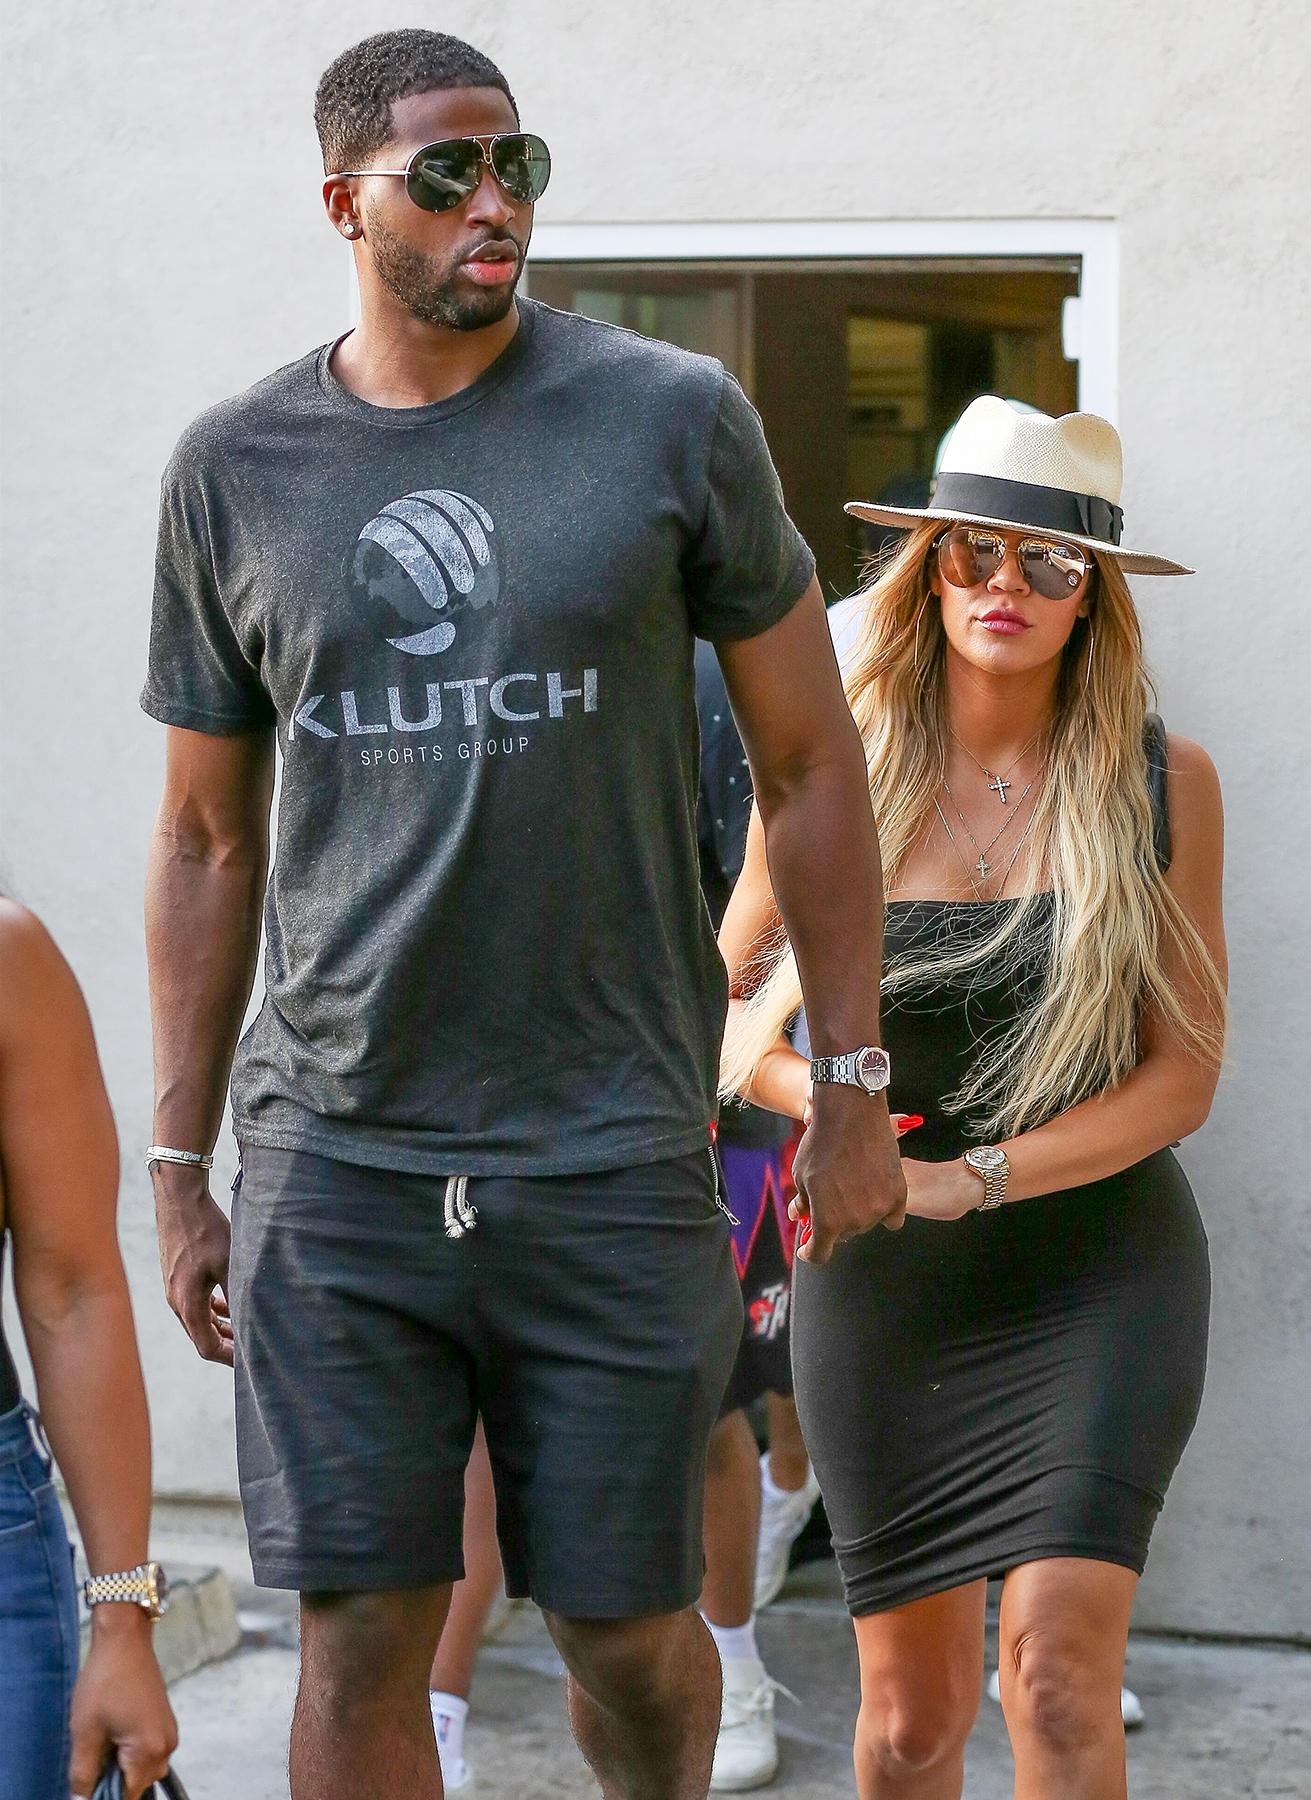 4e21d7b5d22 Khloe Kardashian and Tristan Thompson s Relationship Timeline